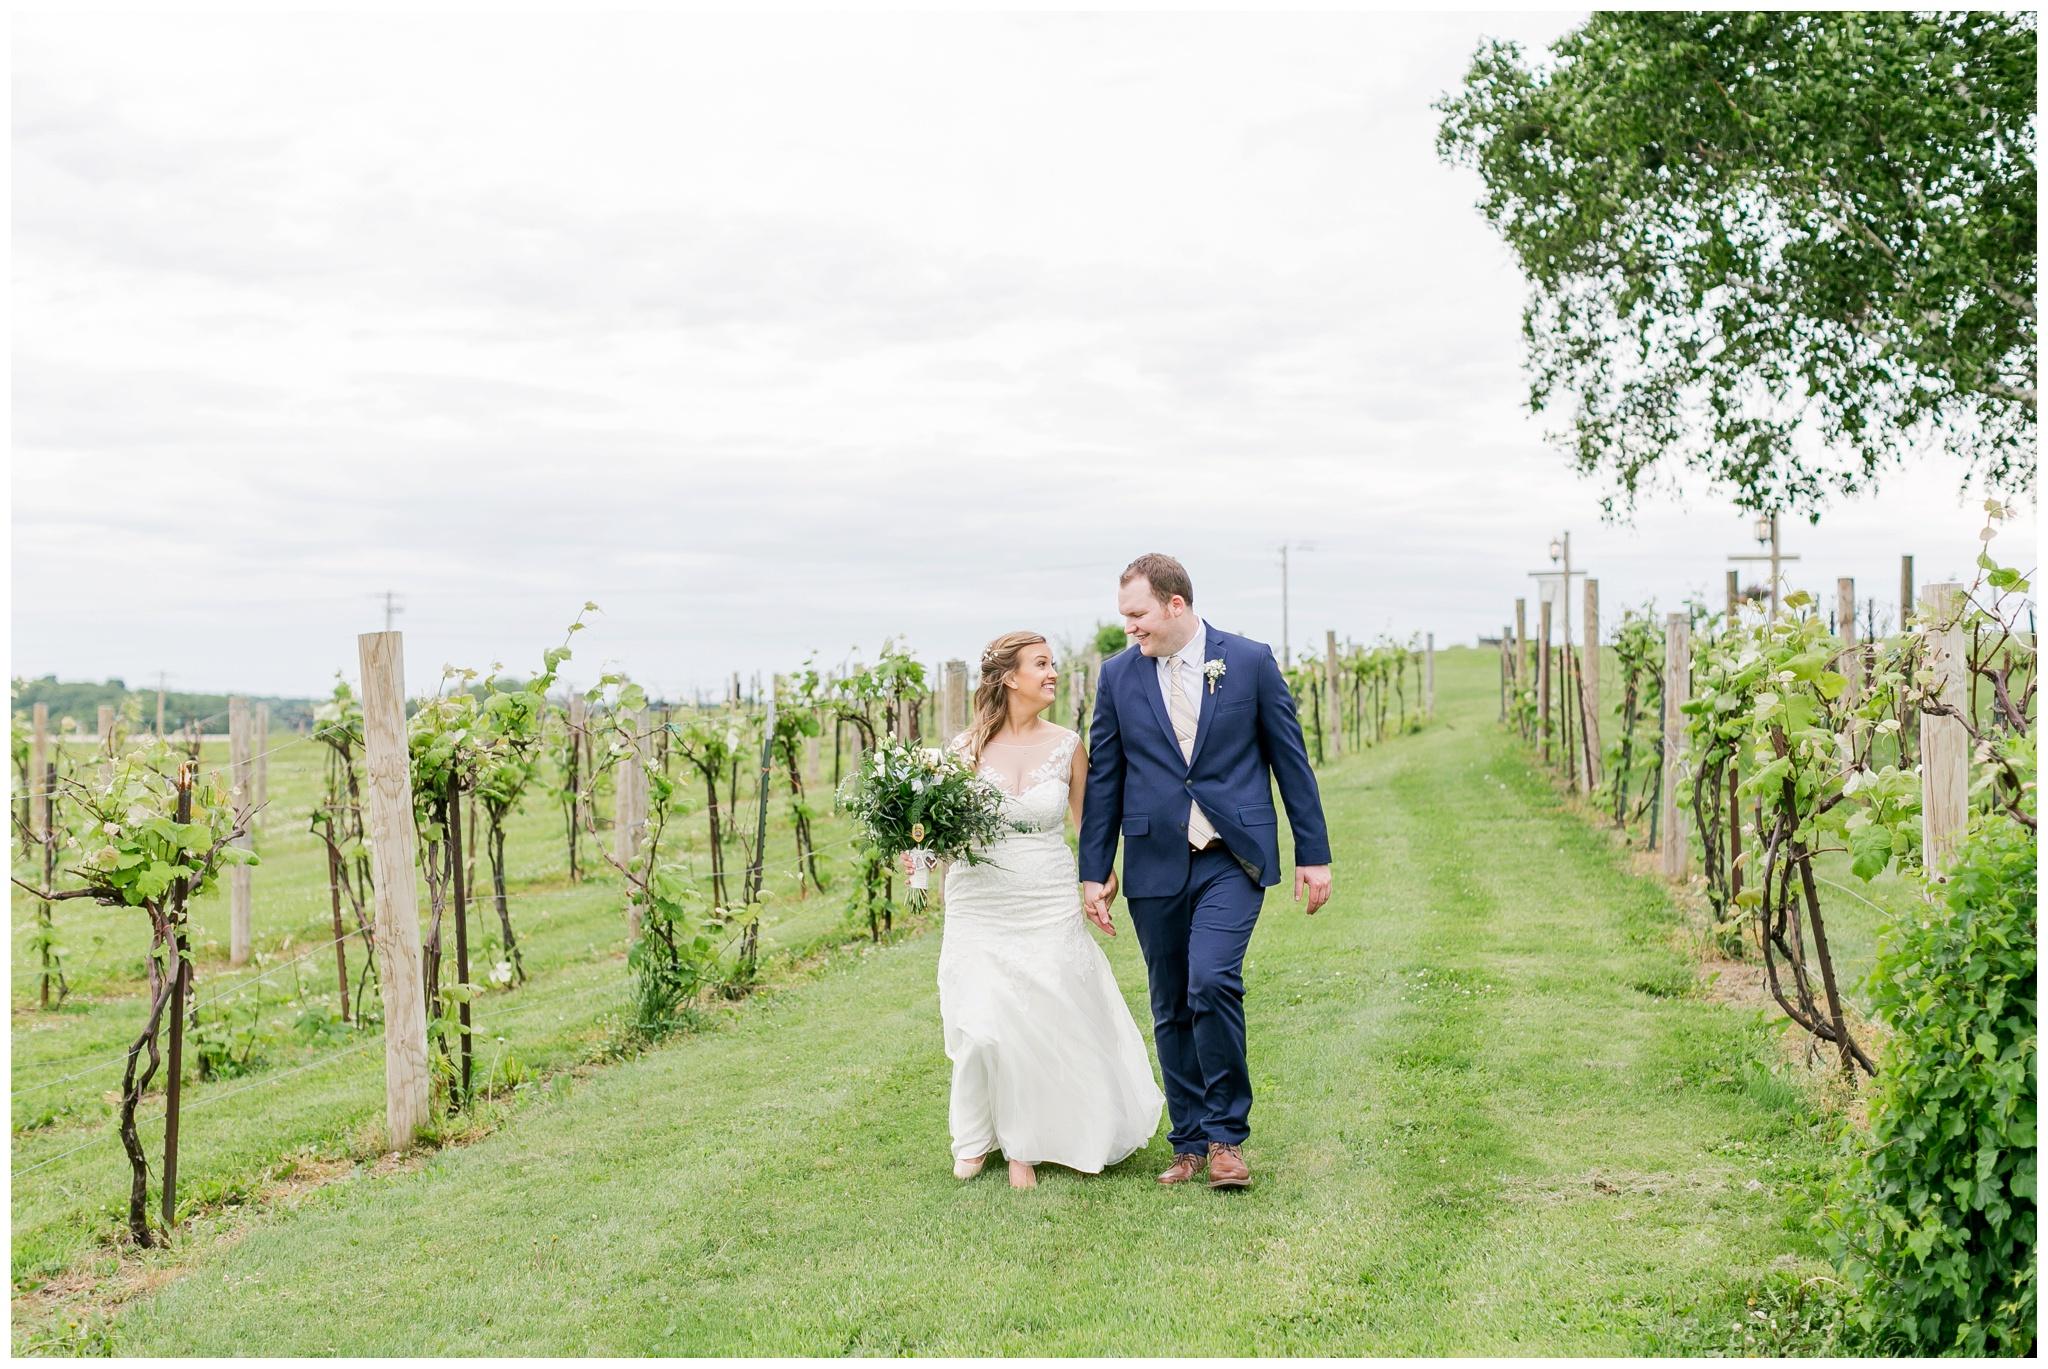 over_the_vines_wedding_edgerton_wisconsin_wedding_caynay_photo_4008.jpg